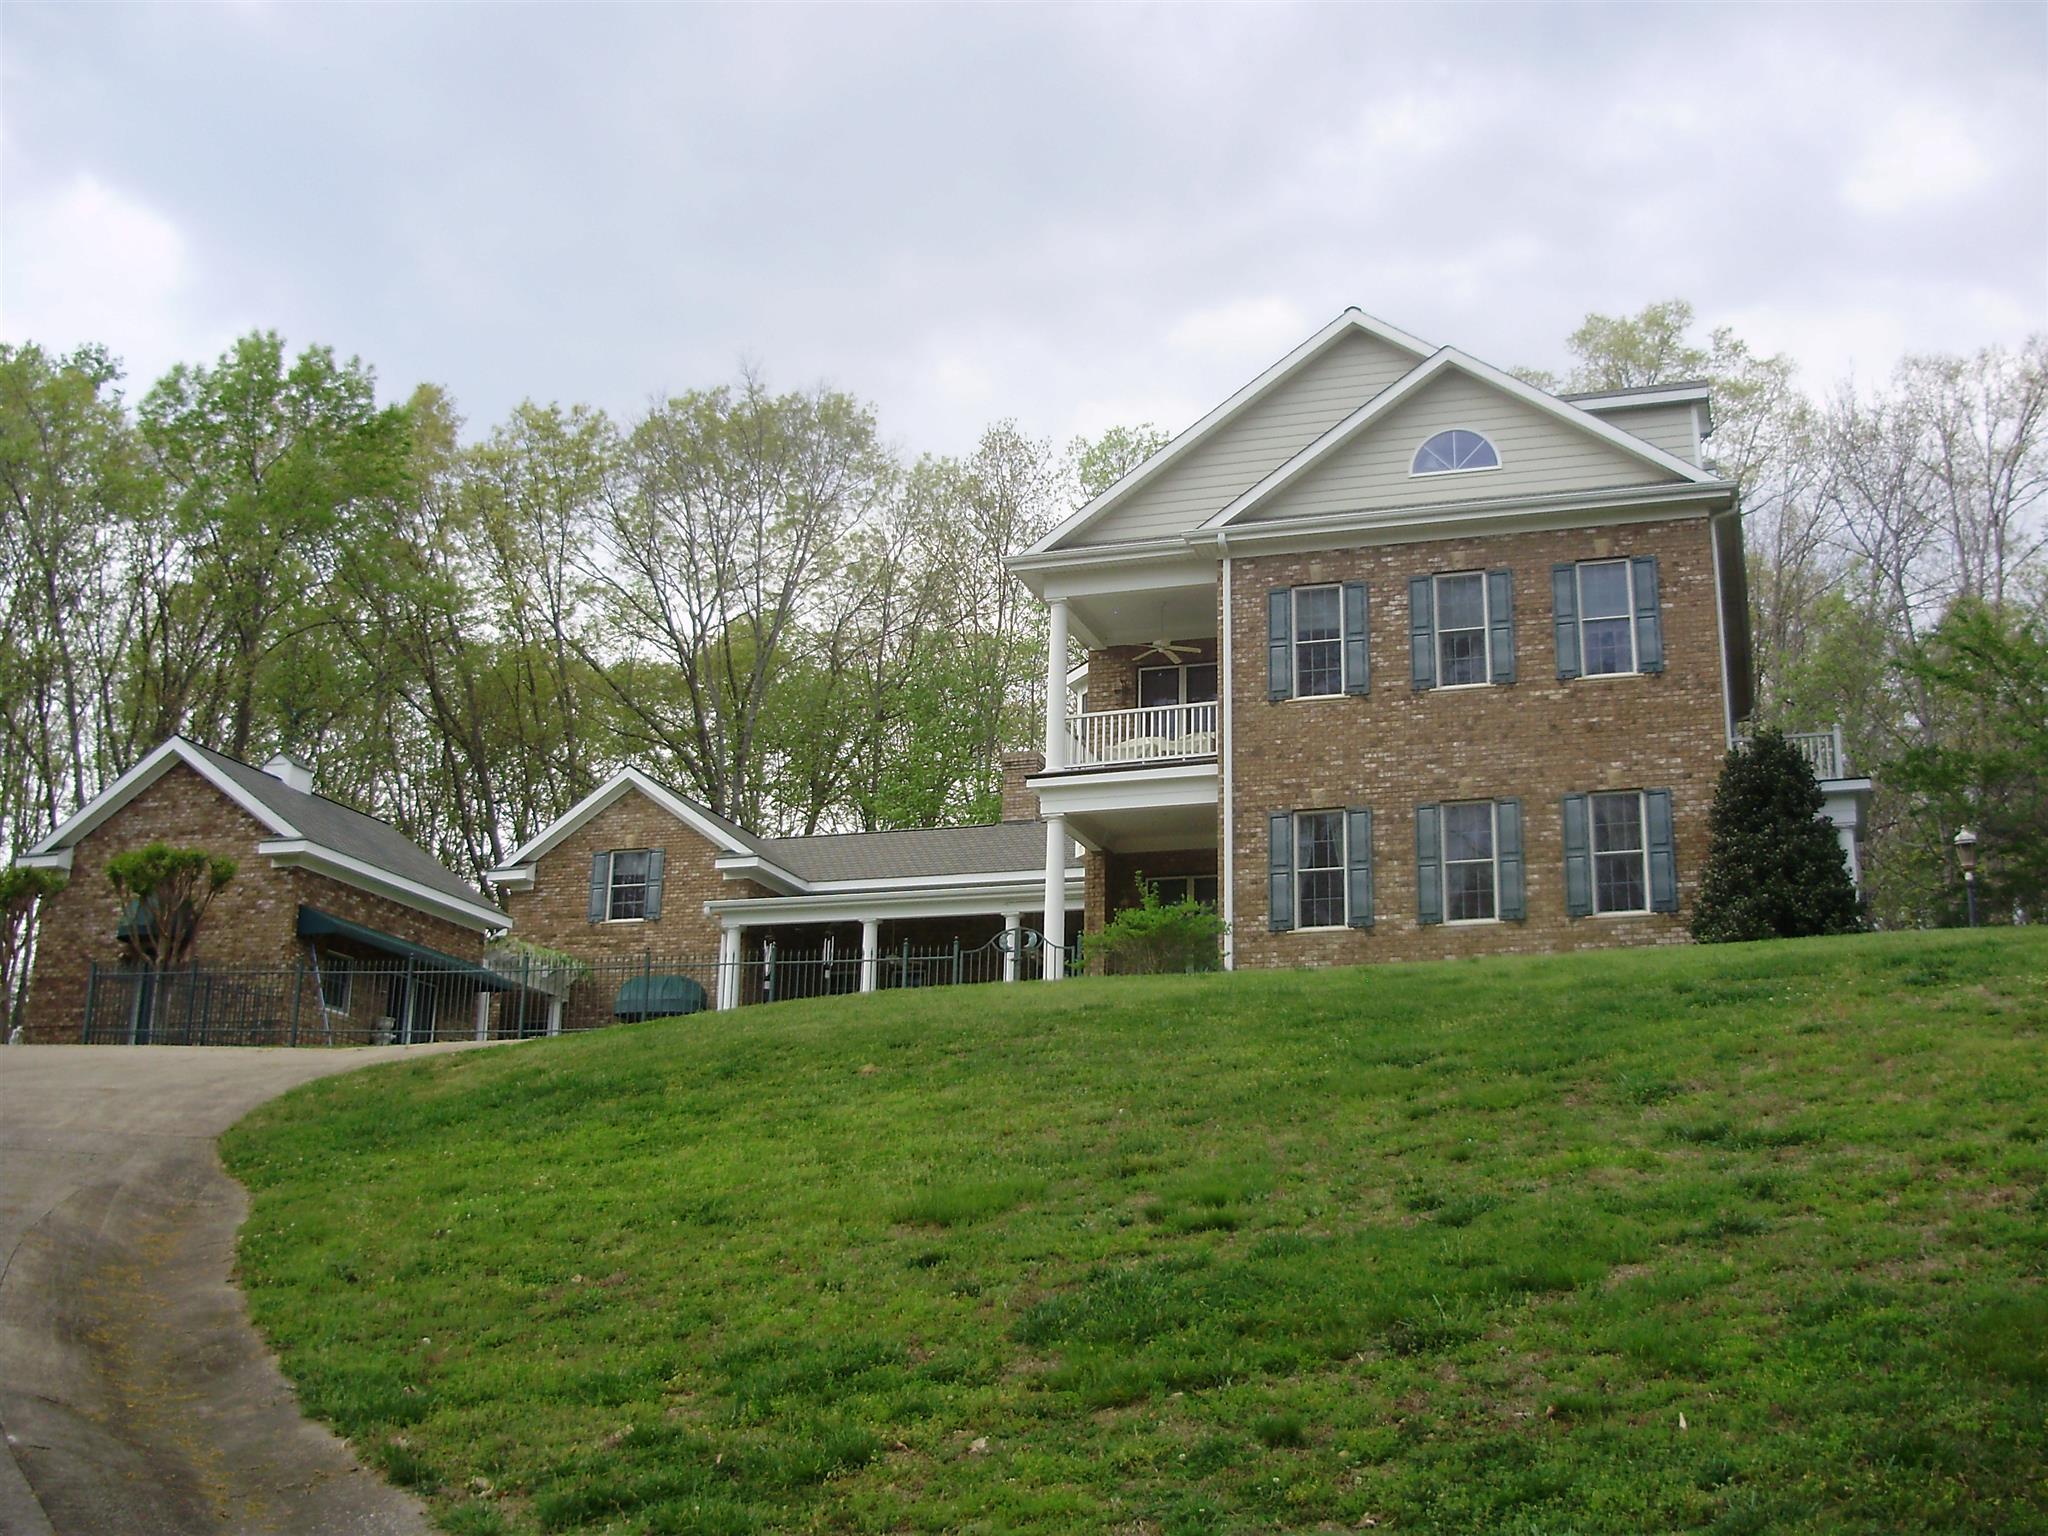 375 Raven Bluff Rd, Lawrenceburg, TN 38464